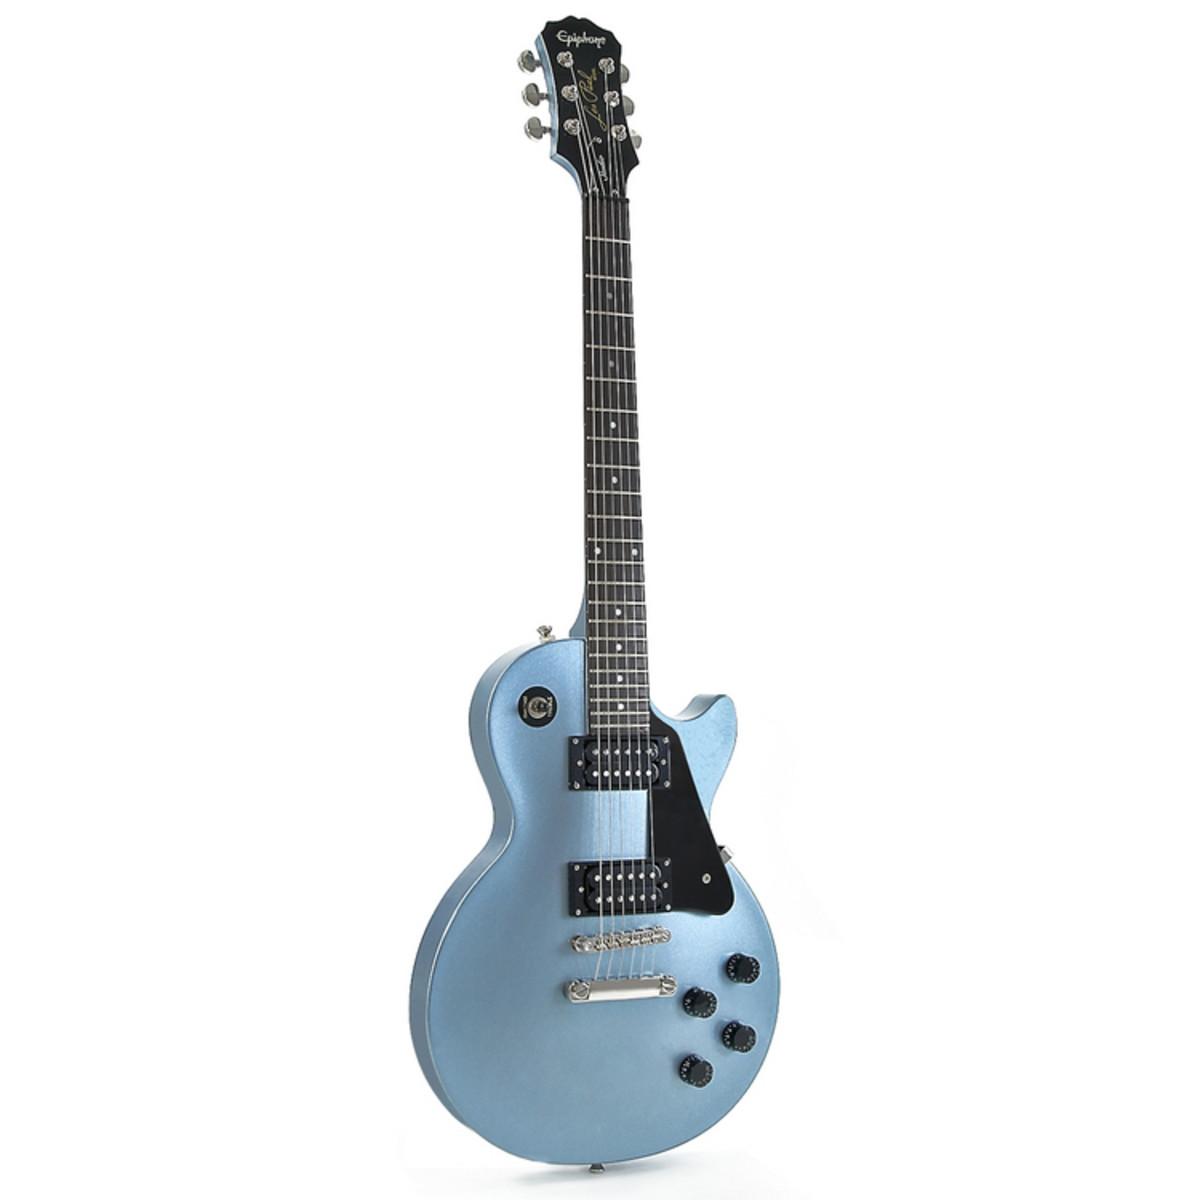 Disc Epiphone Les Paul Studio Special Edition Pelham Blue At Gear4music